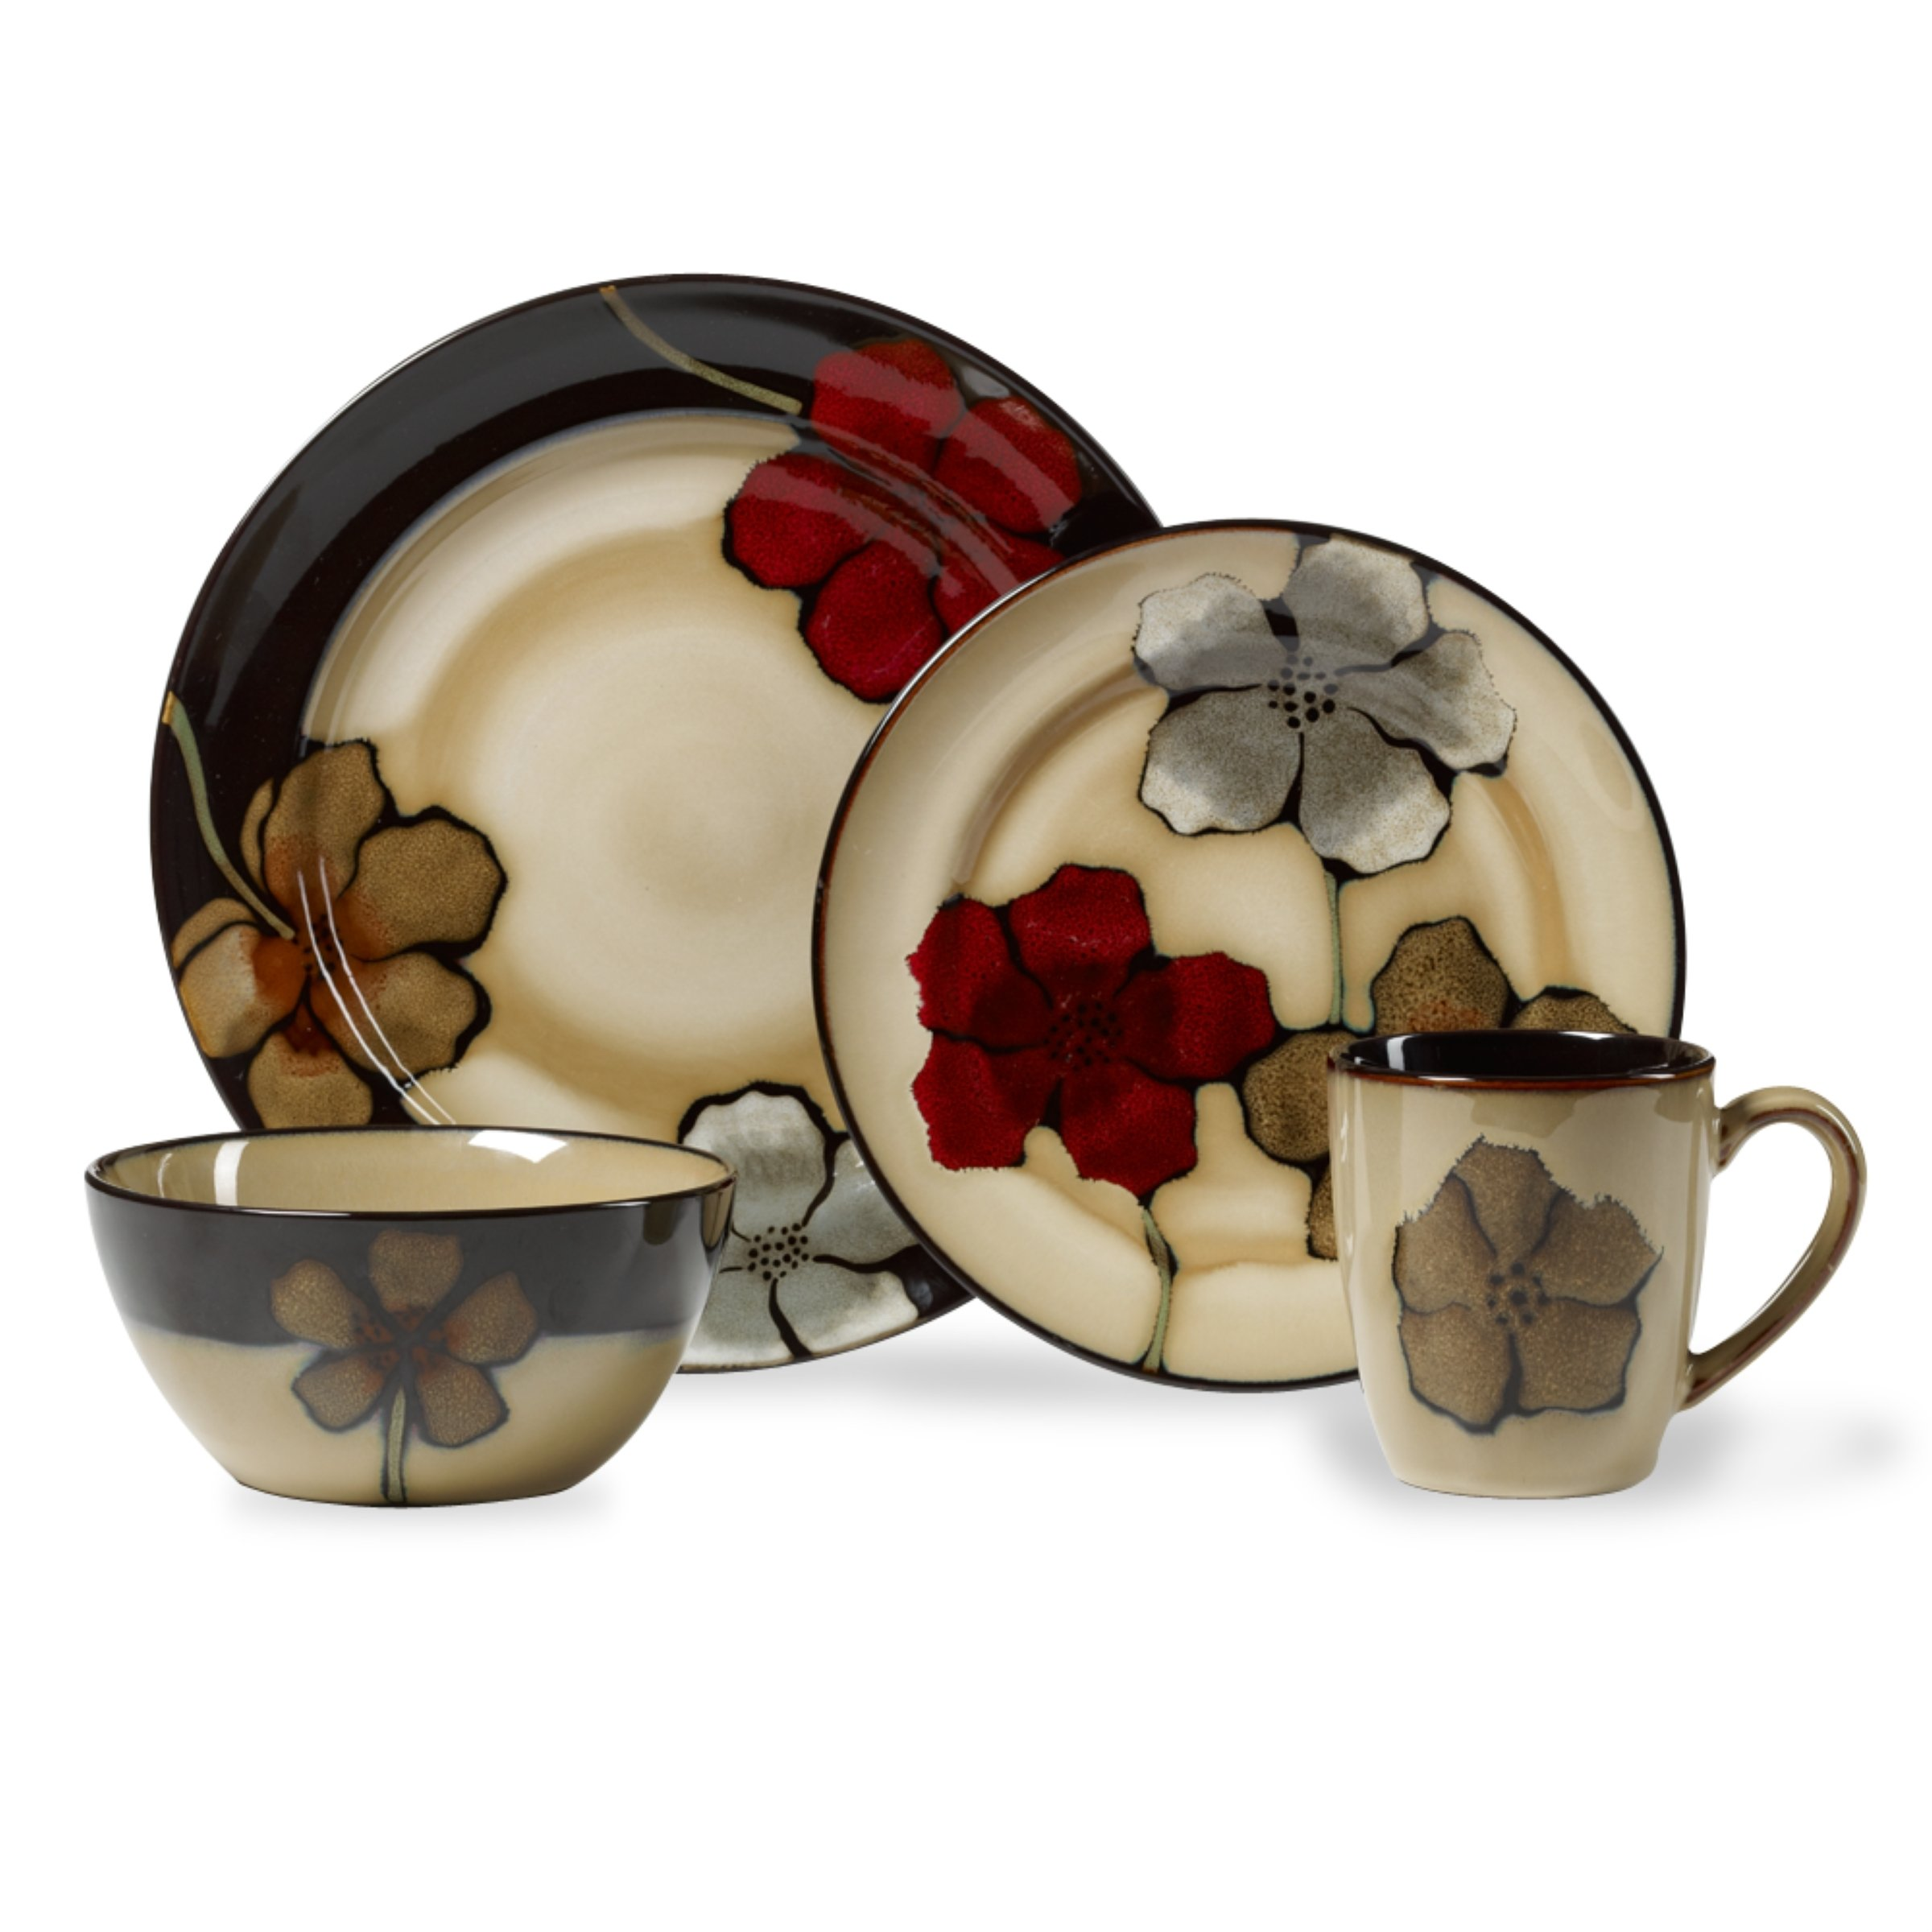 Pfaltzgraff Painted Poppies 16-Piece Stoneware Dinnerware Set, Service for 4